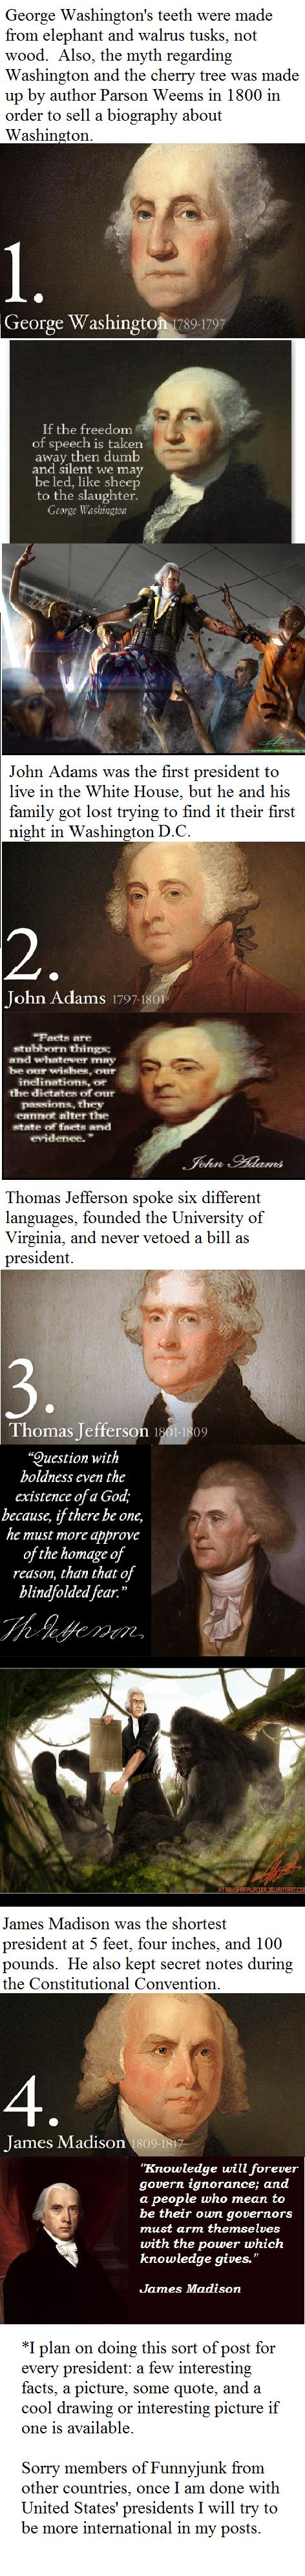 History Time - U.S. Presidents one. United States Presidents 1. George Washington 2. John Adams 3. Thomas Jefferson 4. James Madison.. No need to apologize. I find this interesting, nonetheless. United States Pr